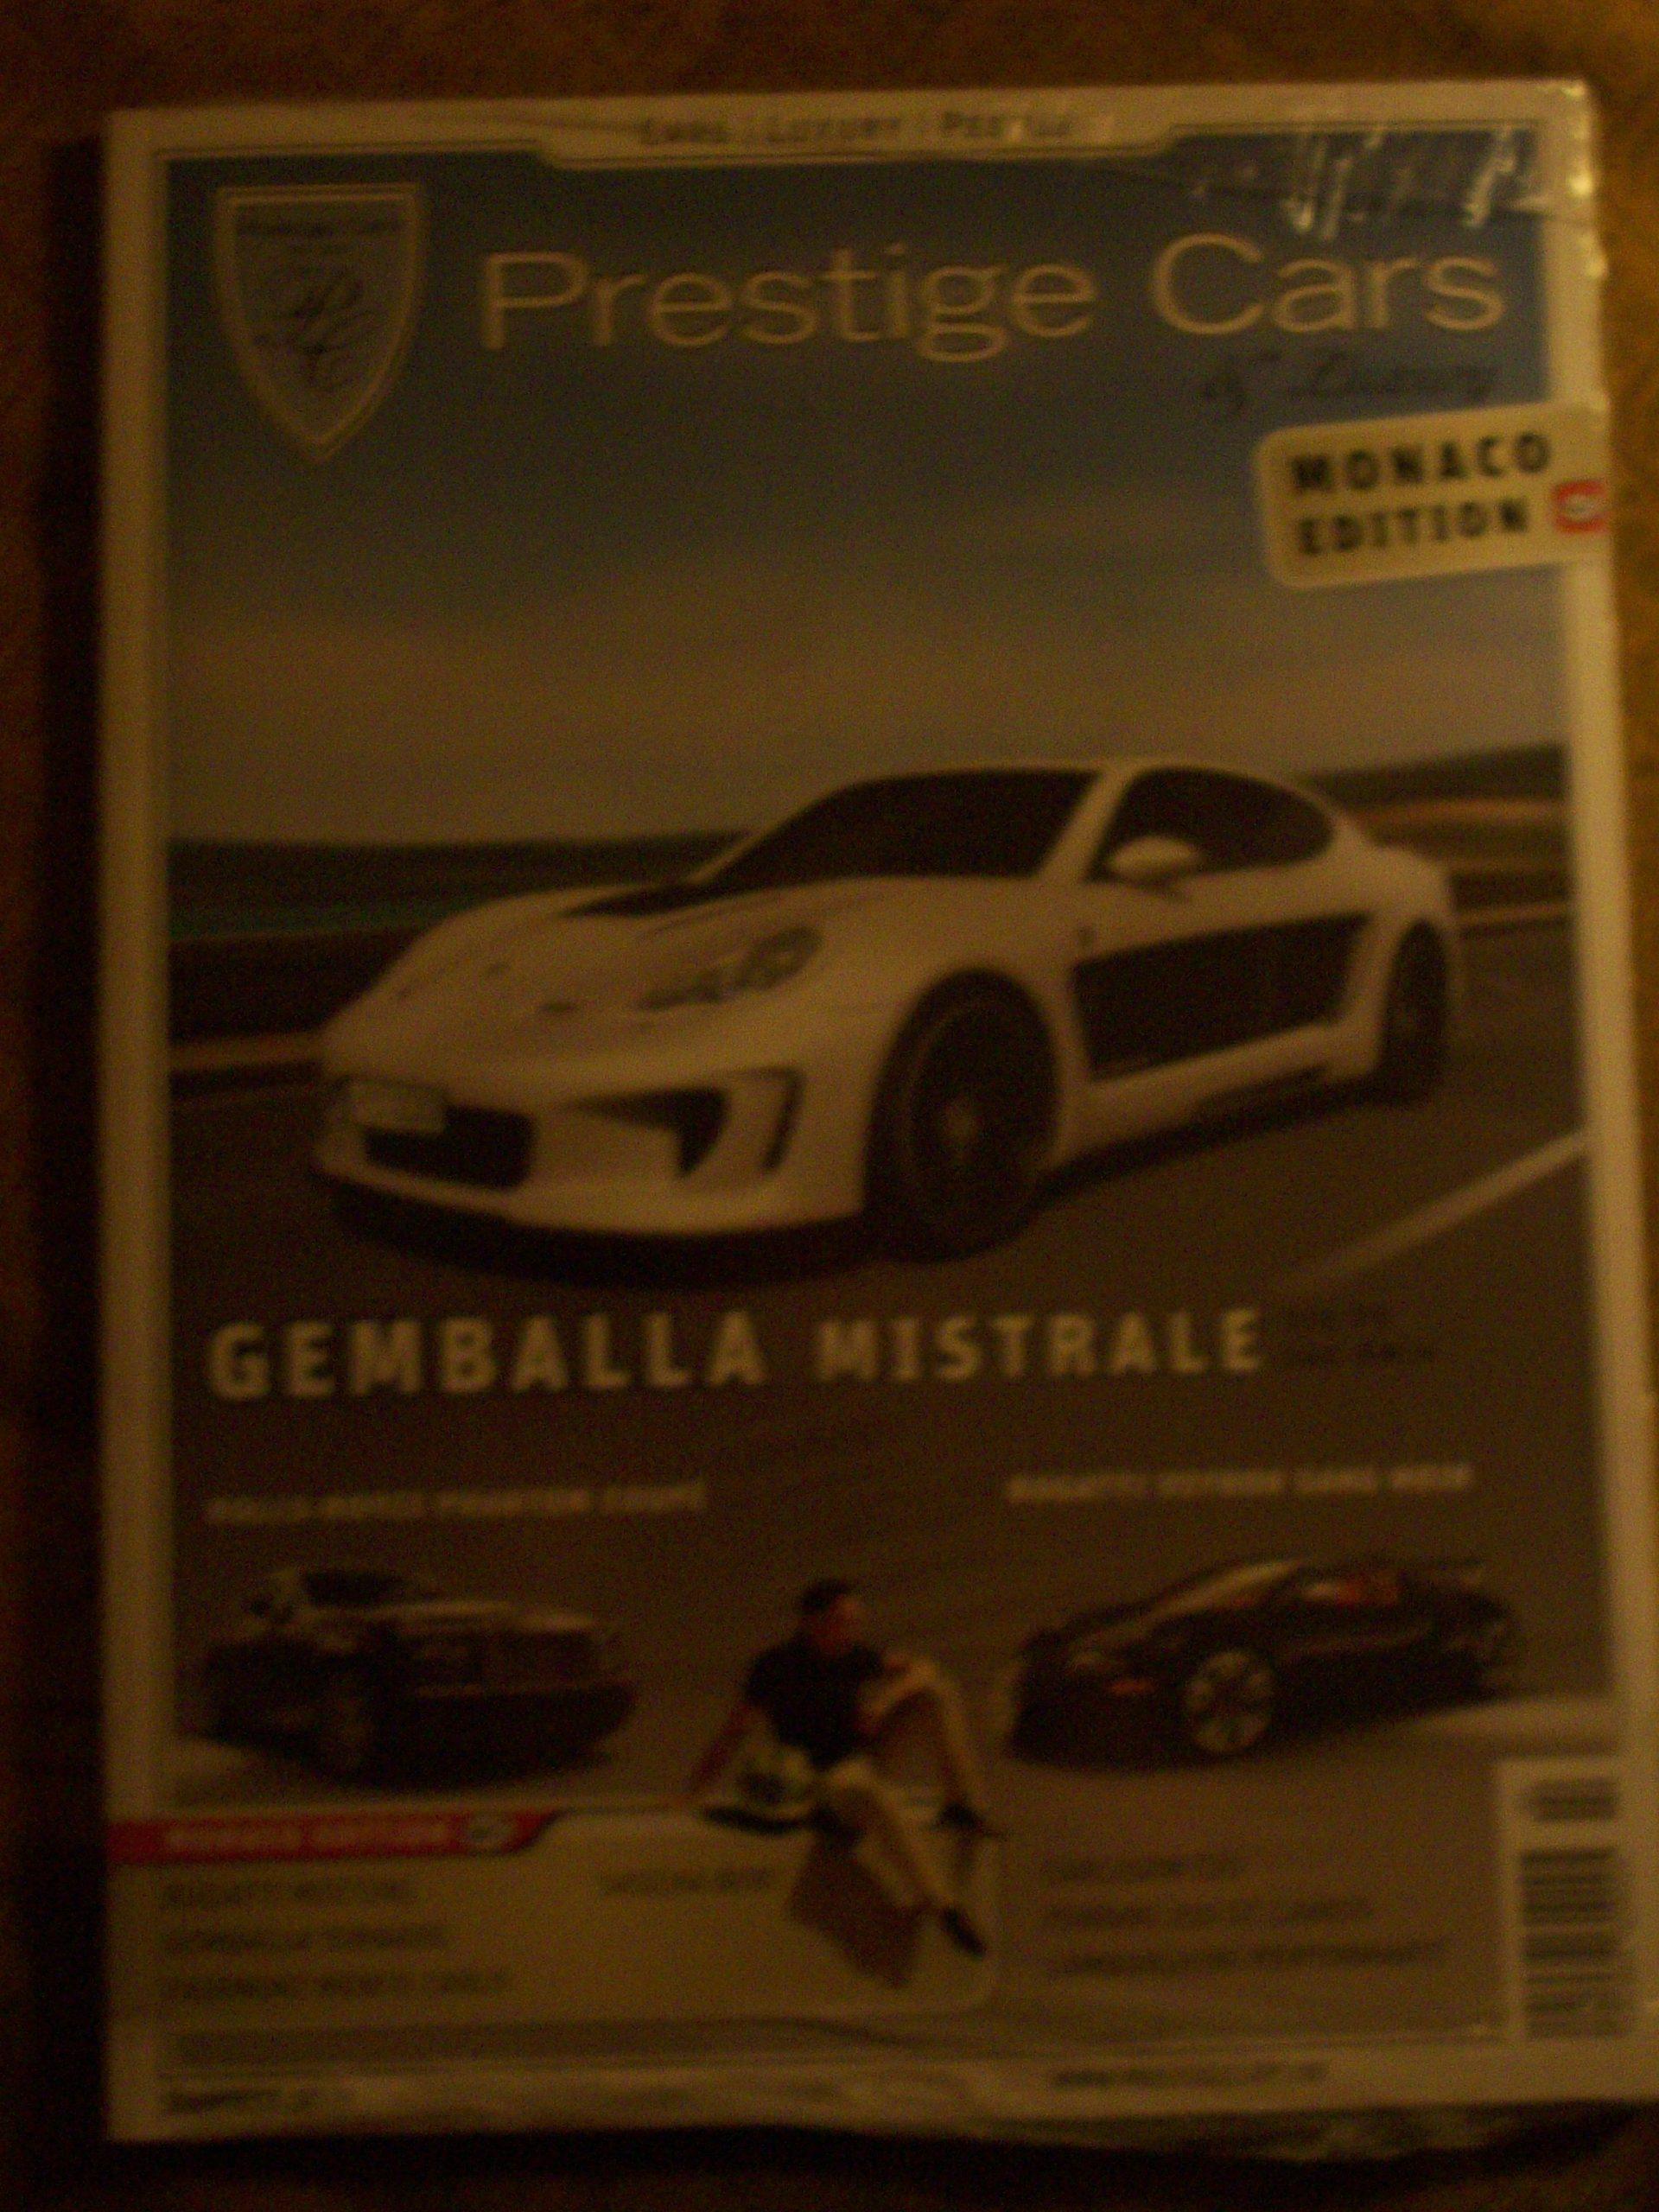 Prestige Cars Titel- Monaco Edition - August 2011